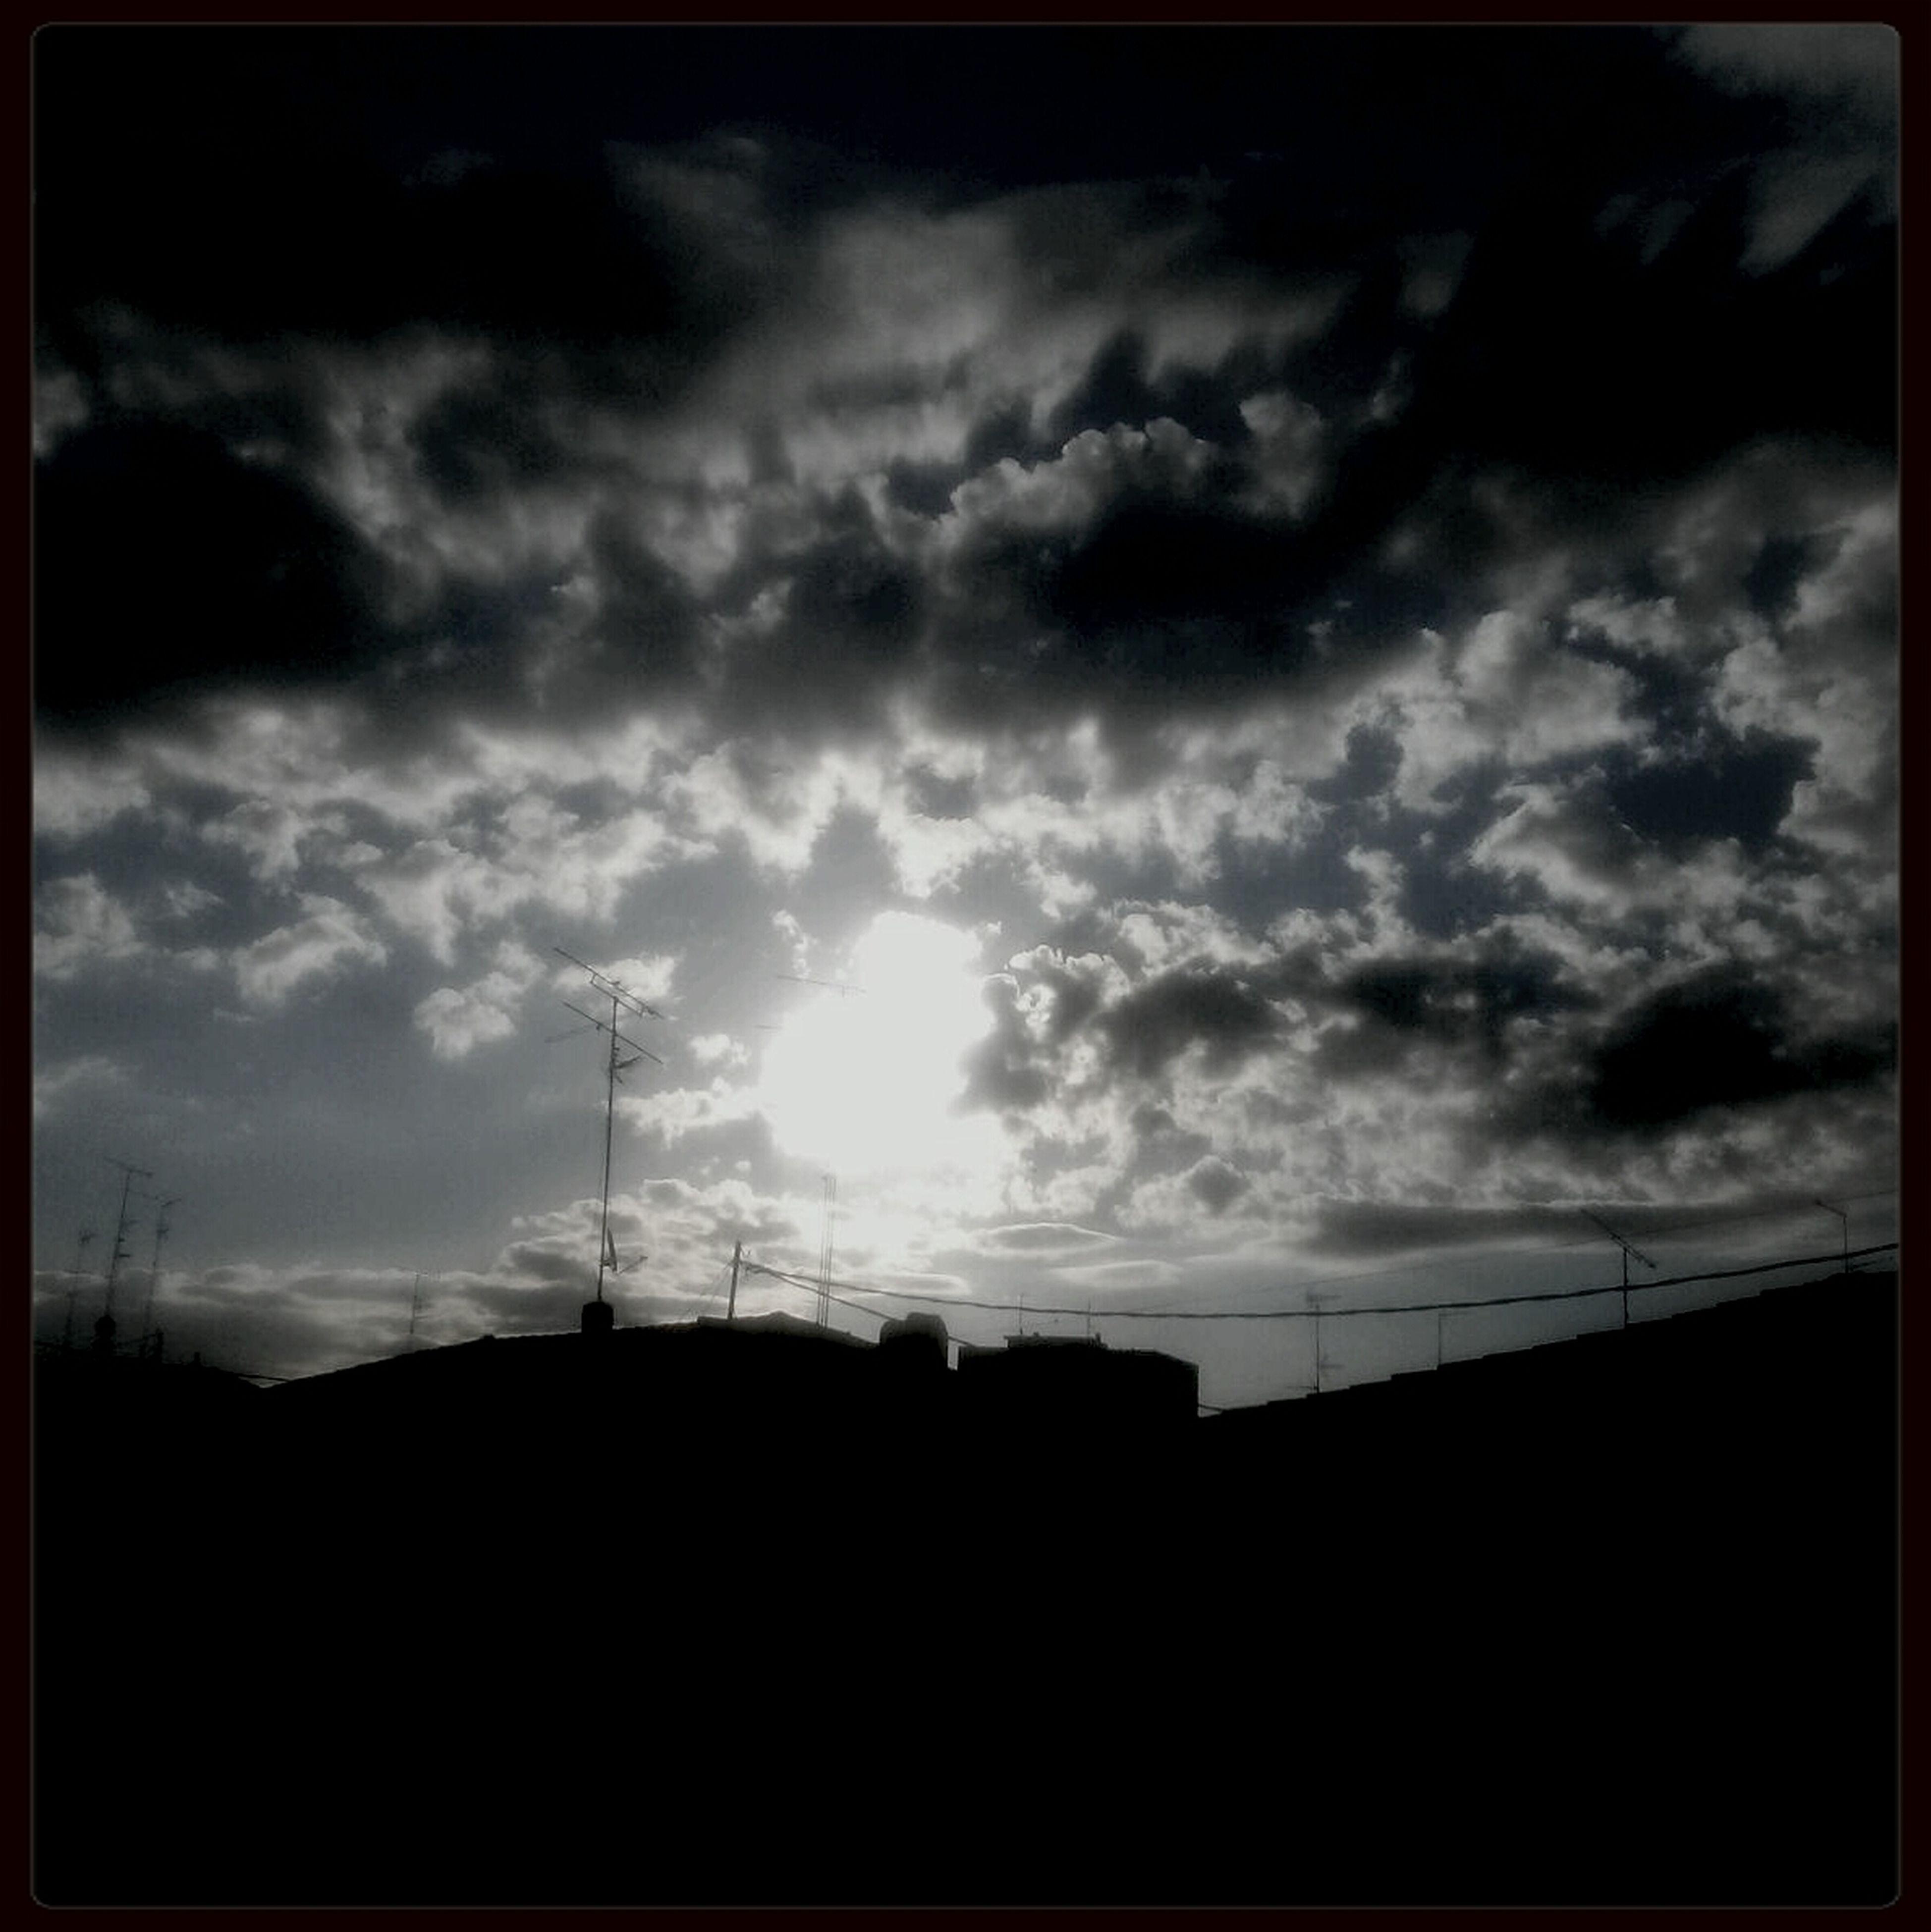 silhouette, sky, cloud - sky, low angle view, built structure, building exterior, architecture, cloudy, sunset, cloud, electricity pylon, power line, weather, overcast, transfer print, dusk, nature, dark, outdoors, house